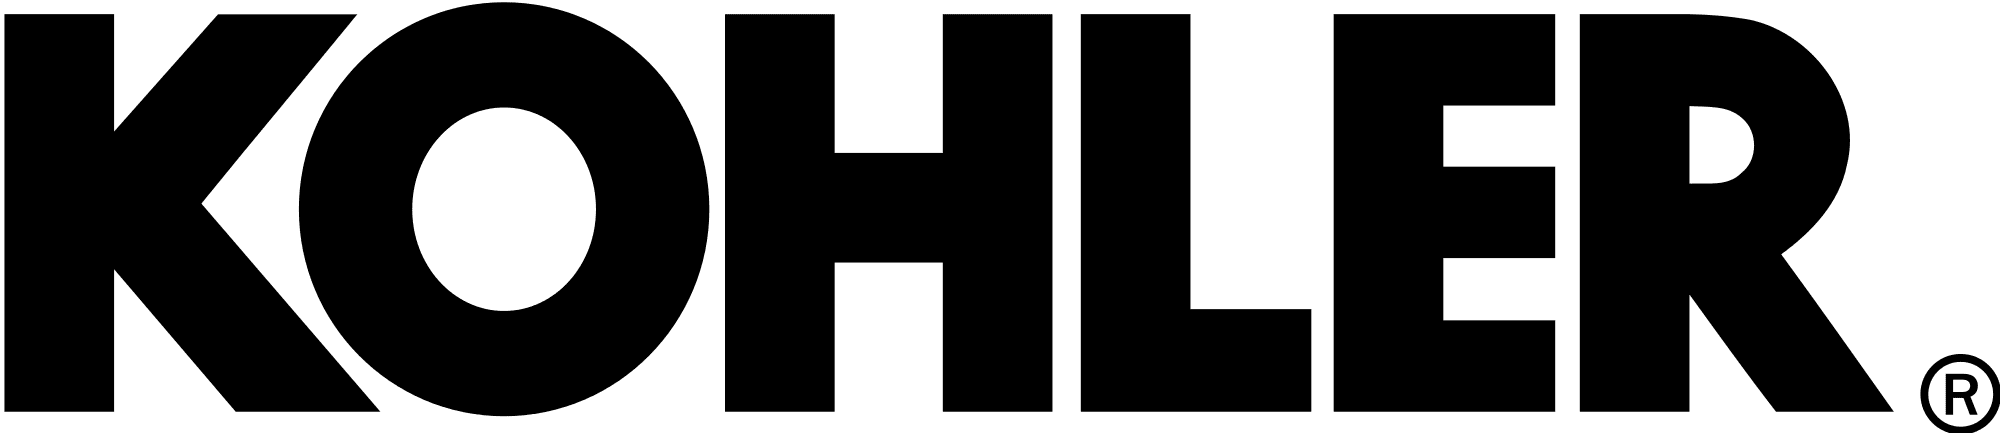 https://www.coorsexteriors.com/wp-content/uploads/2018/11/Kohler-Logo.png